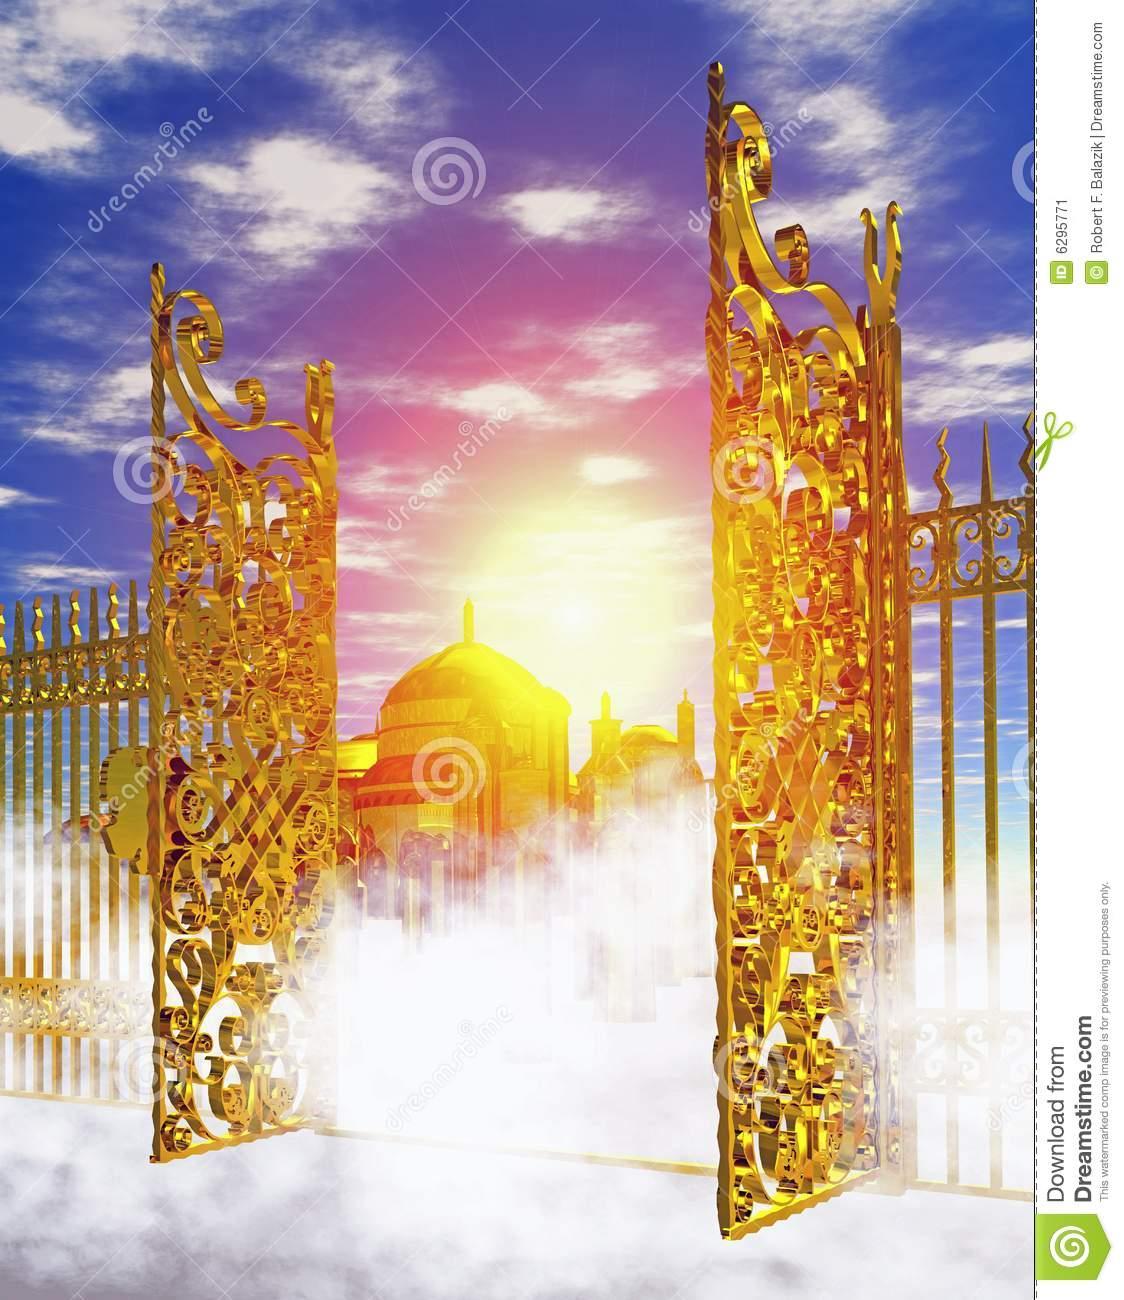 Haven clipart gates heaven Gate Heaven_gate Christian heaven's Heaven_gate